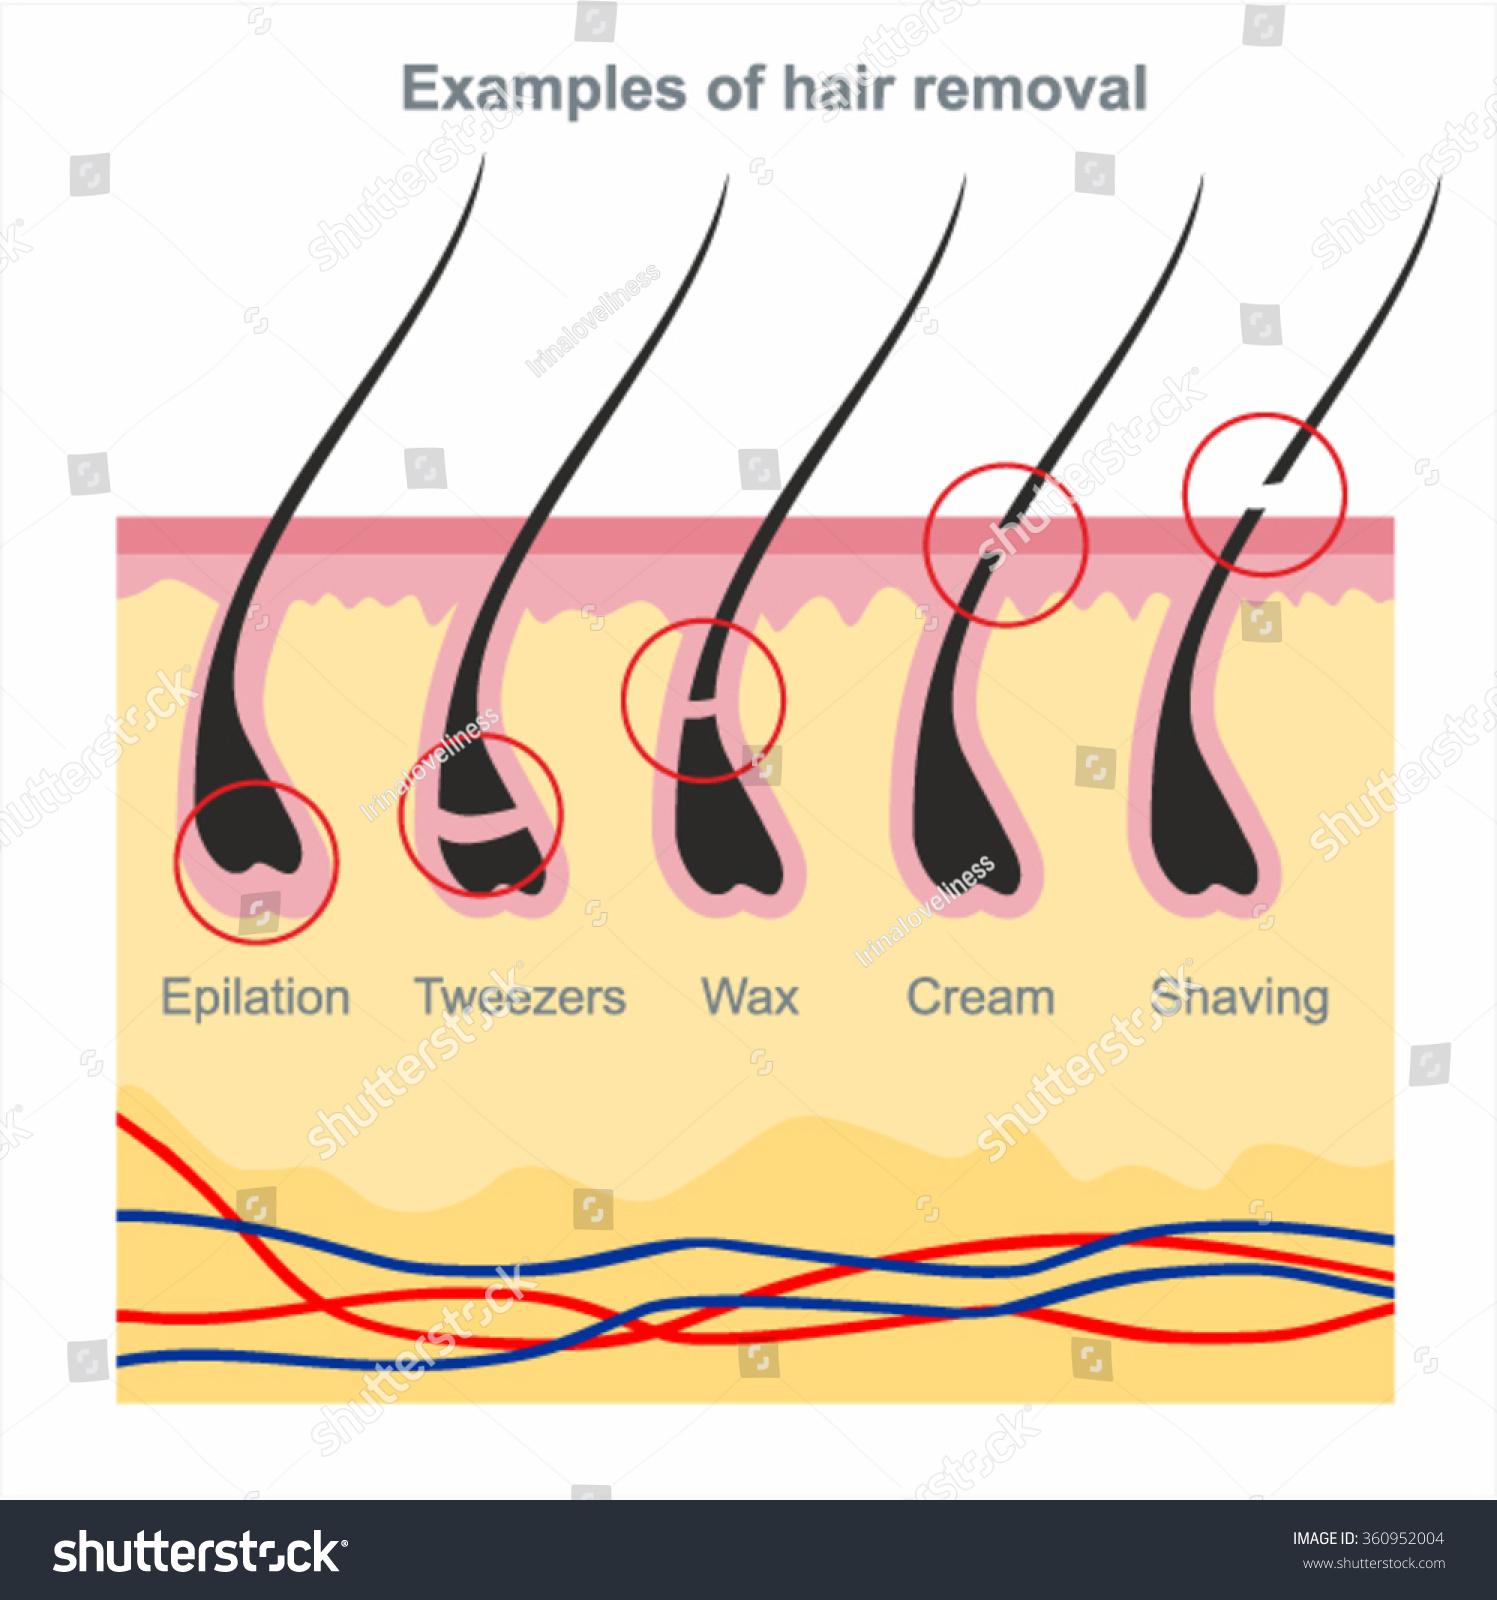 Examples Of Hair Removal Waxing Shaving Tweezers